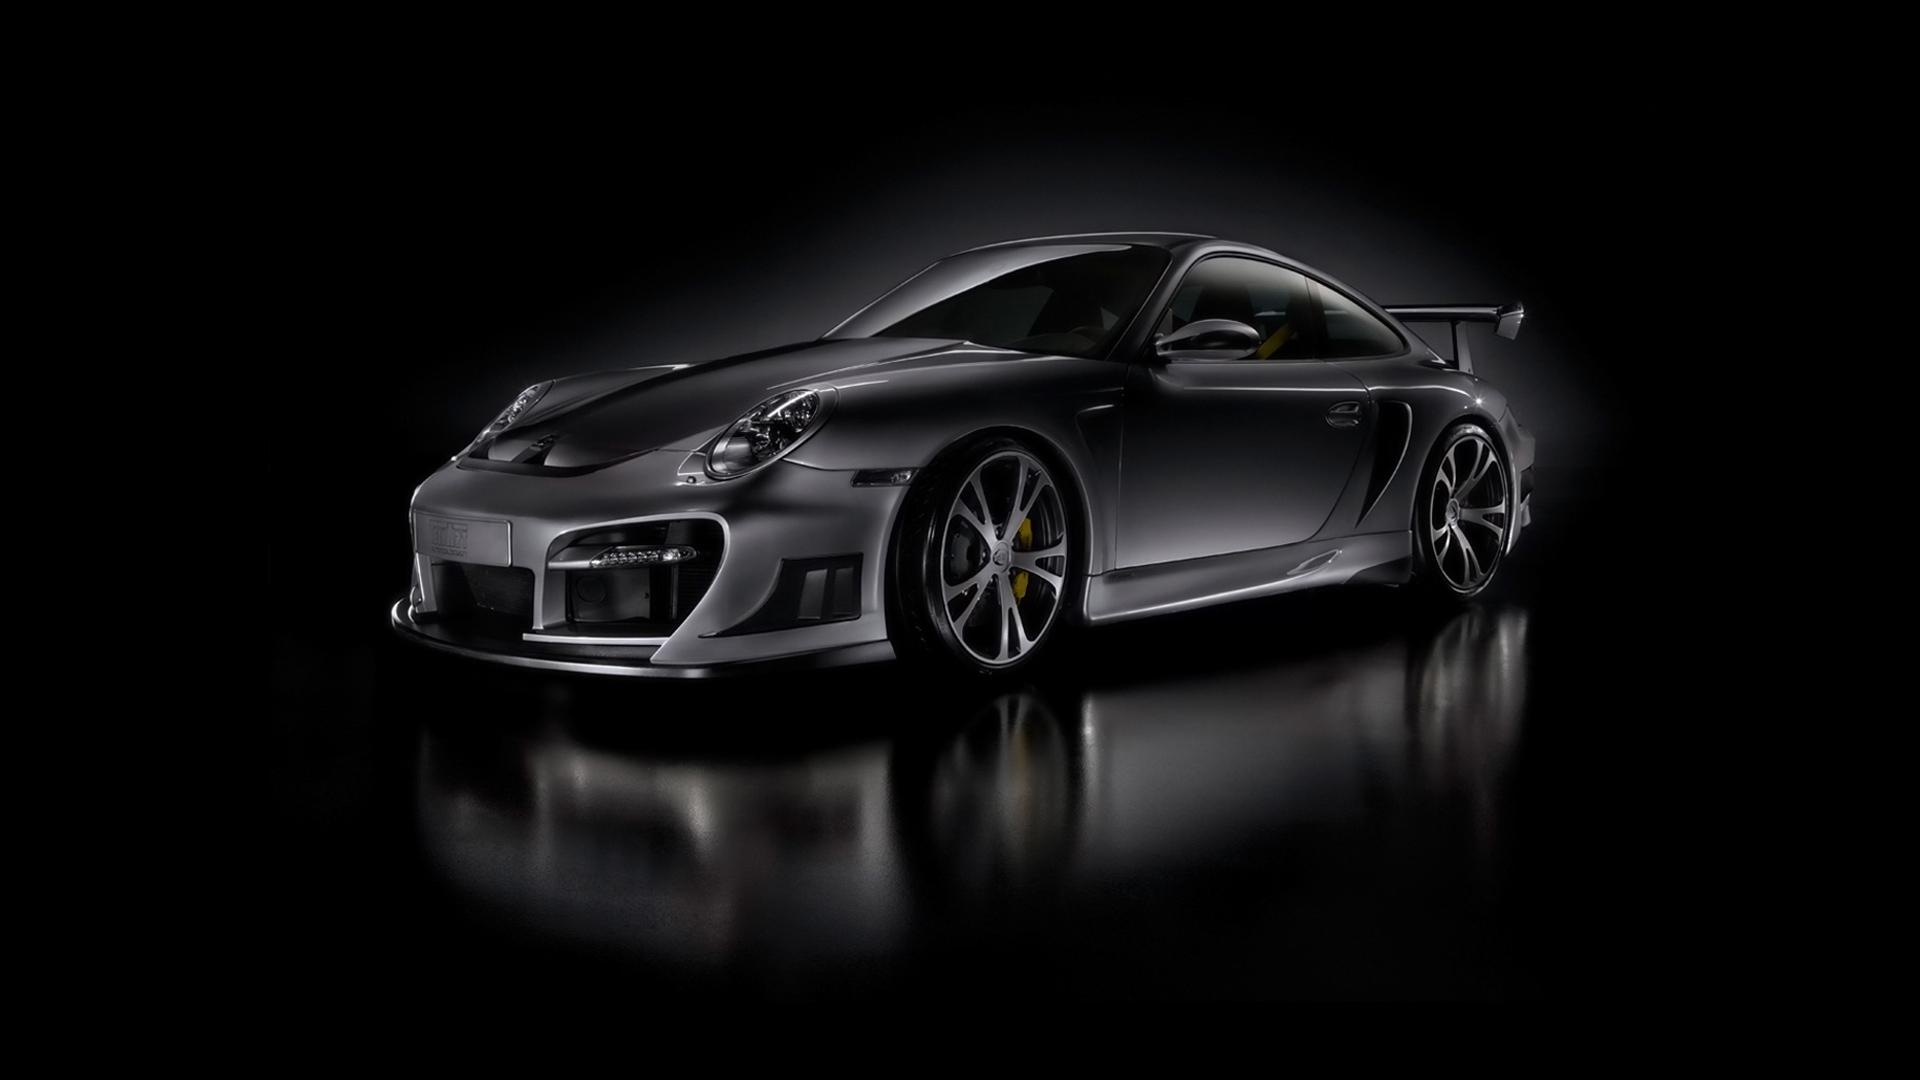 Porsche Car Models Pictures Information X 295240 Wallpaper wallpaper